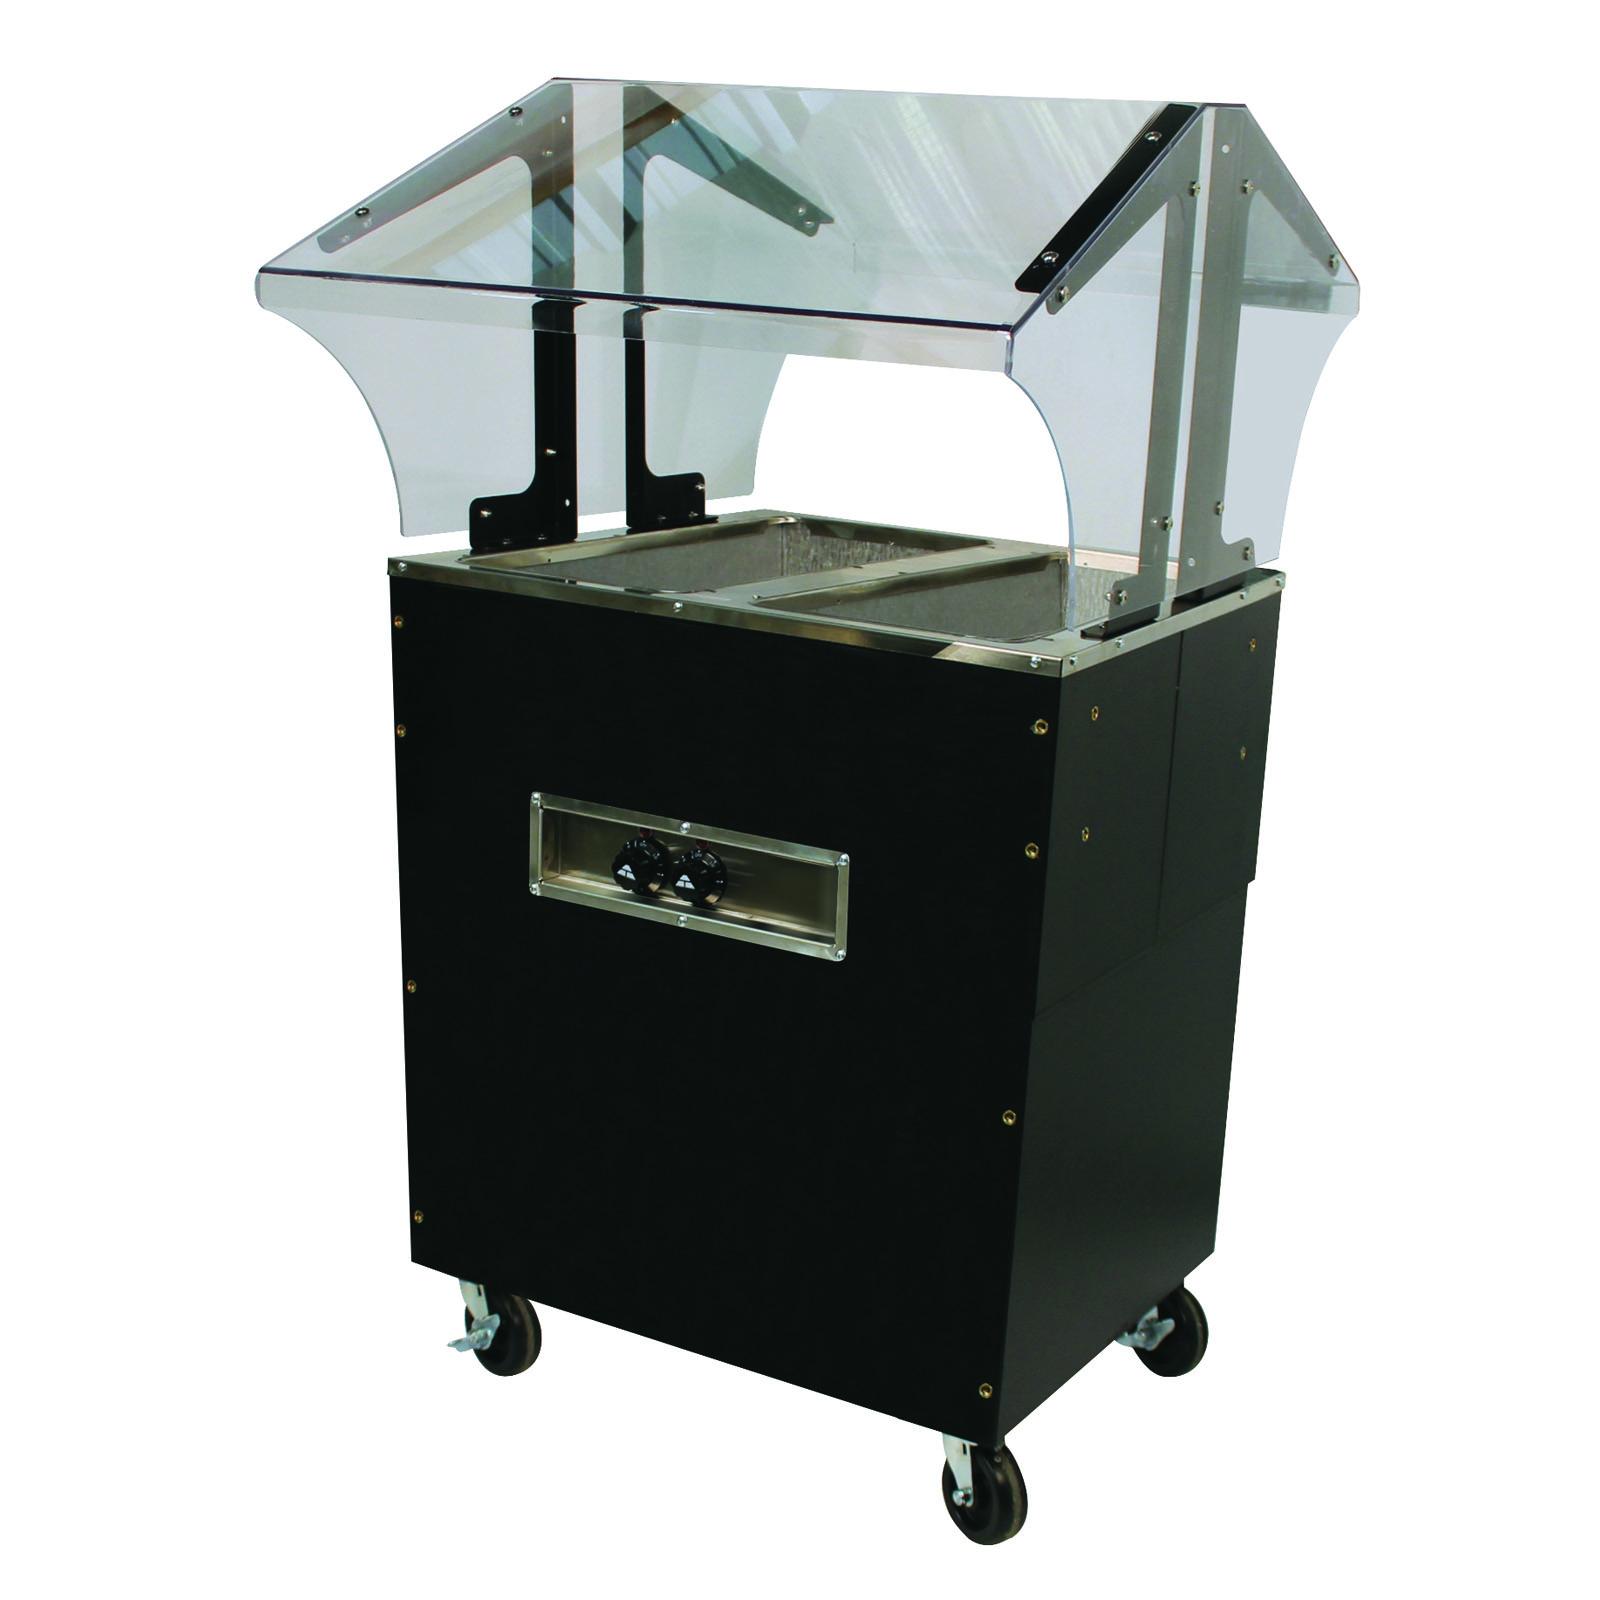 Advance Tabco B2-240-B-S-SB serving counter, hot food, electric